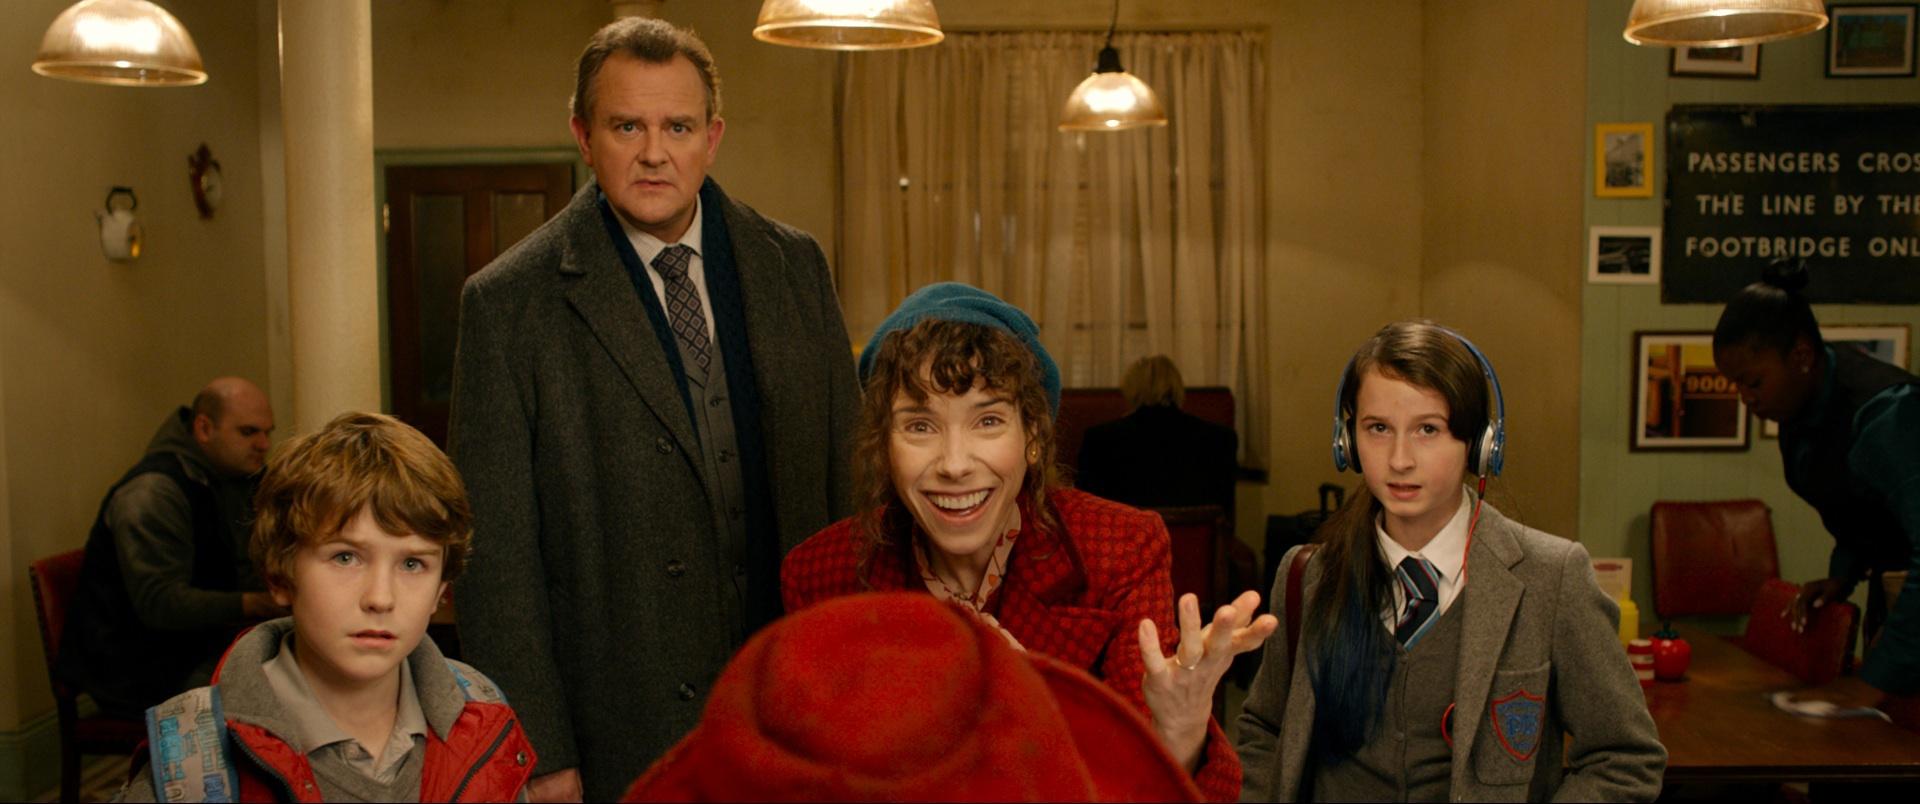 Hugh Bonneville, Sally Hawkins, Madeleine Harris, and Samuel Joslin in Paddington (2014)